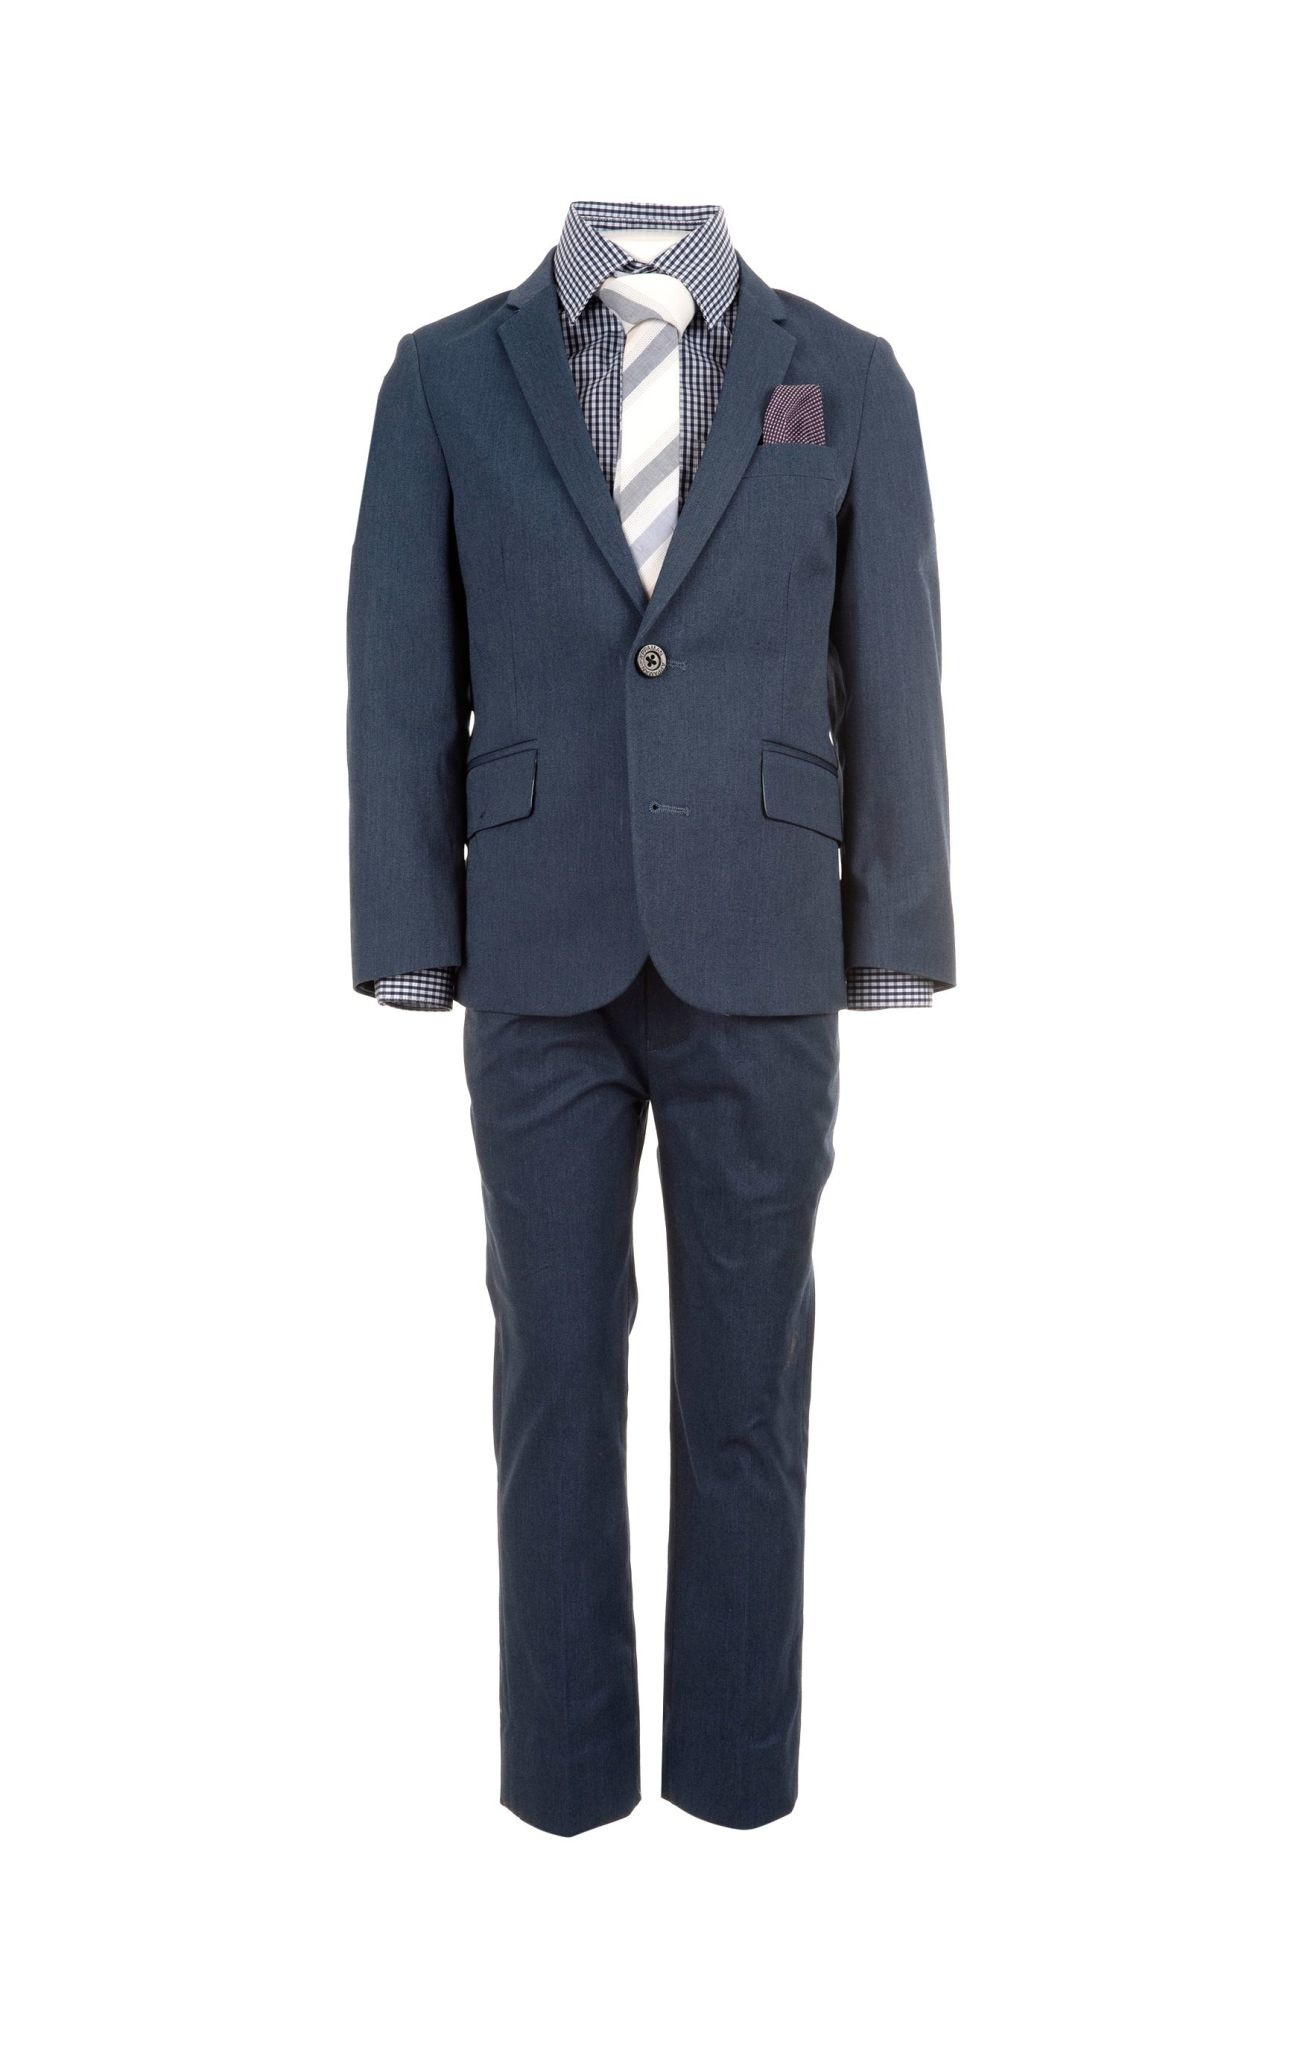 APPAMAN 2-PC Stretchy Mod Suit